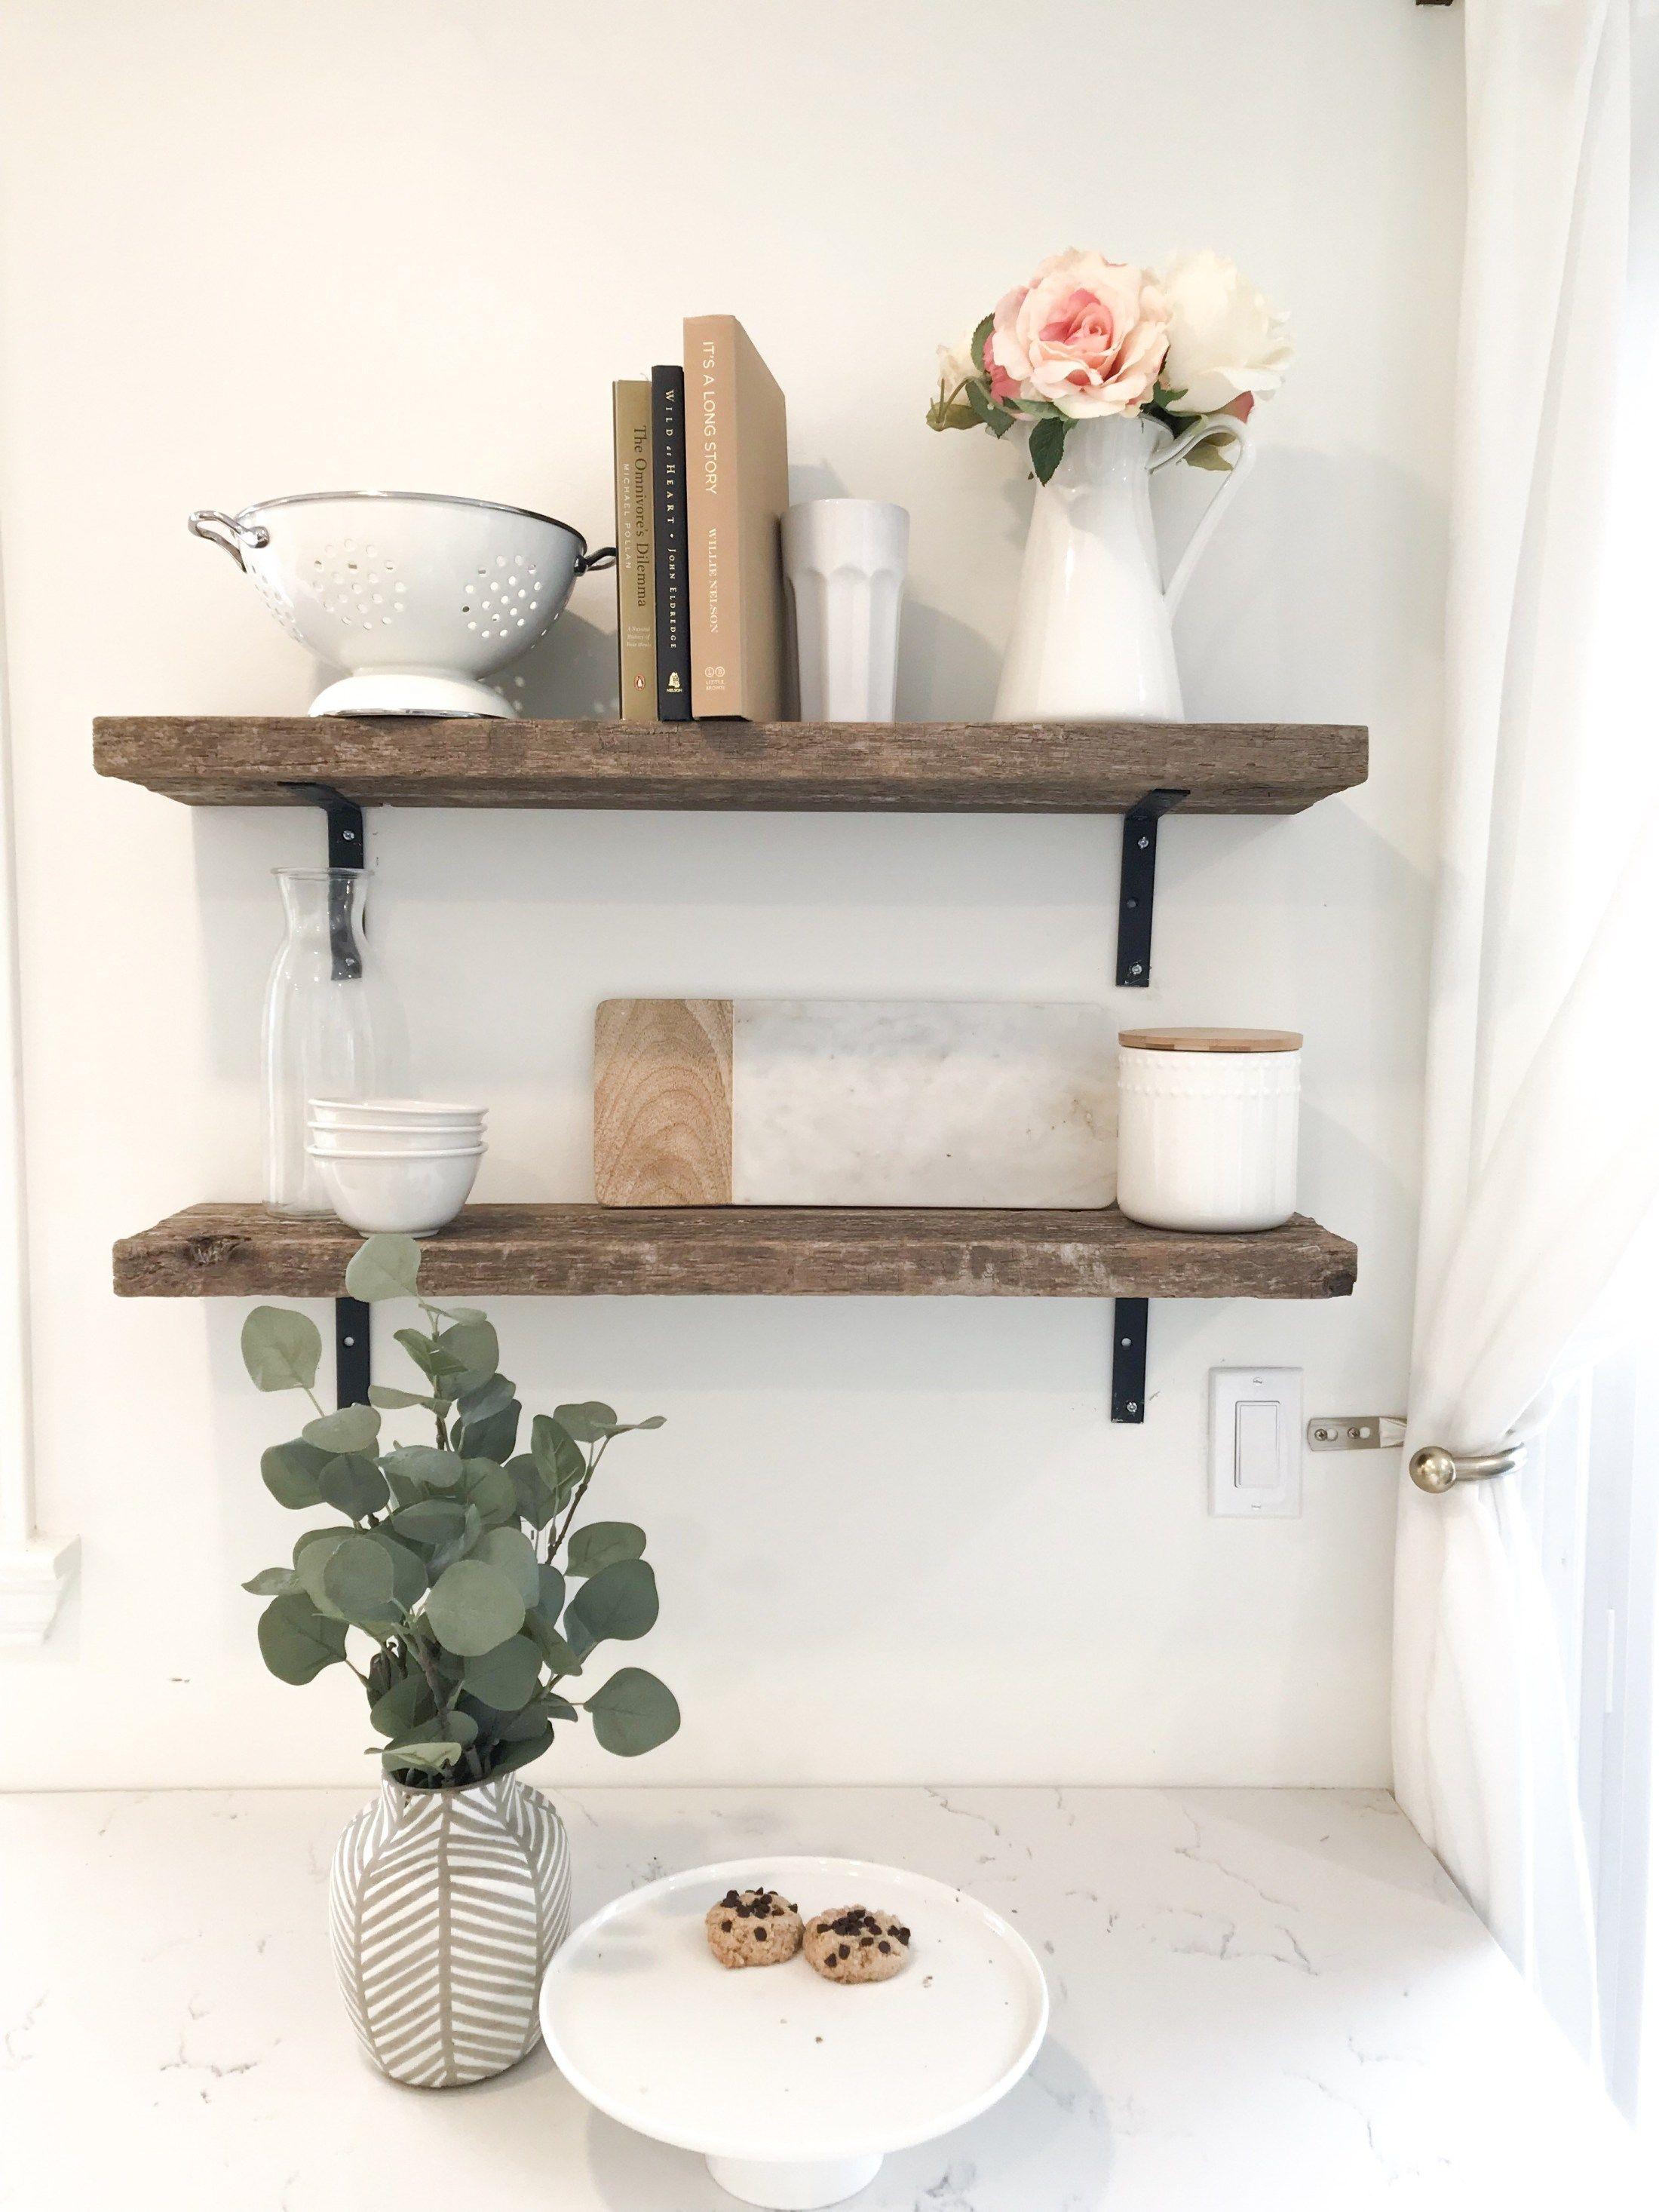 diy rustic open farmhouse shelves with images kitchen wall decor bohemian style kitchen on farmhouse kitchen shelf decor id=78169